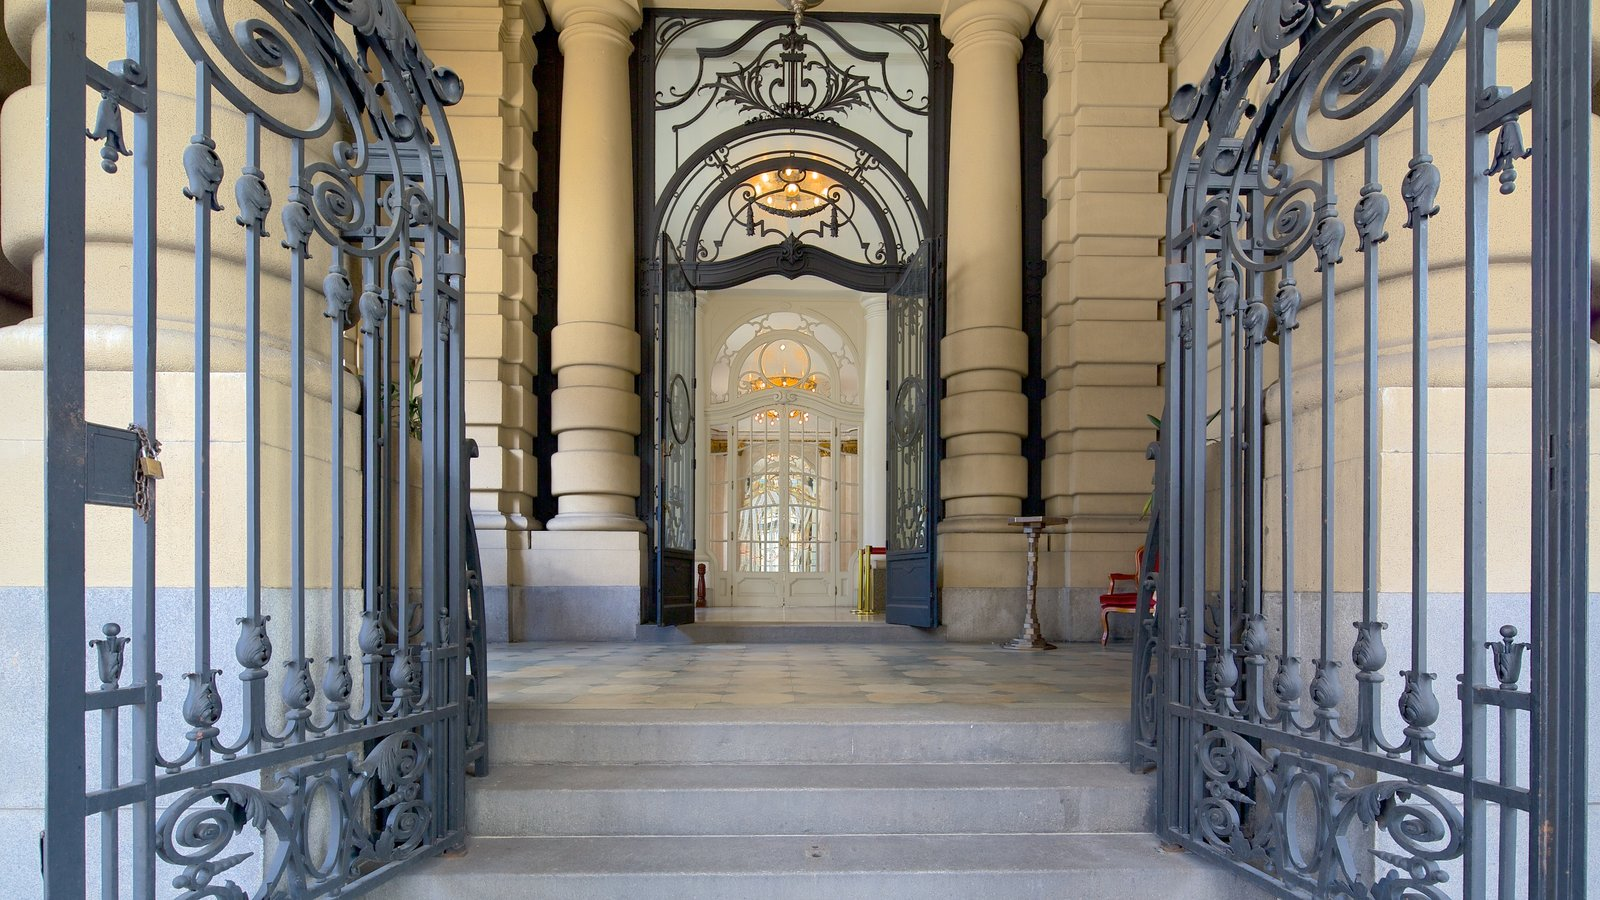 Teatro Municipal caracterizando arquitetura de patrimônio e vistas internas